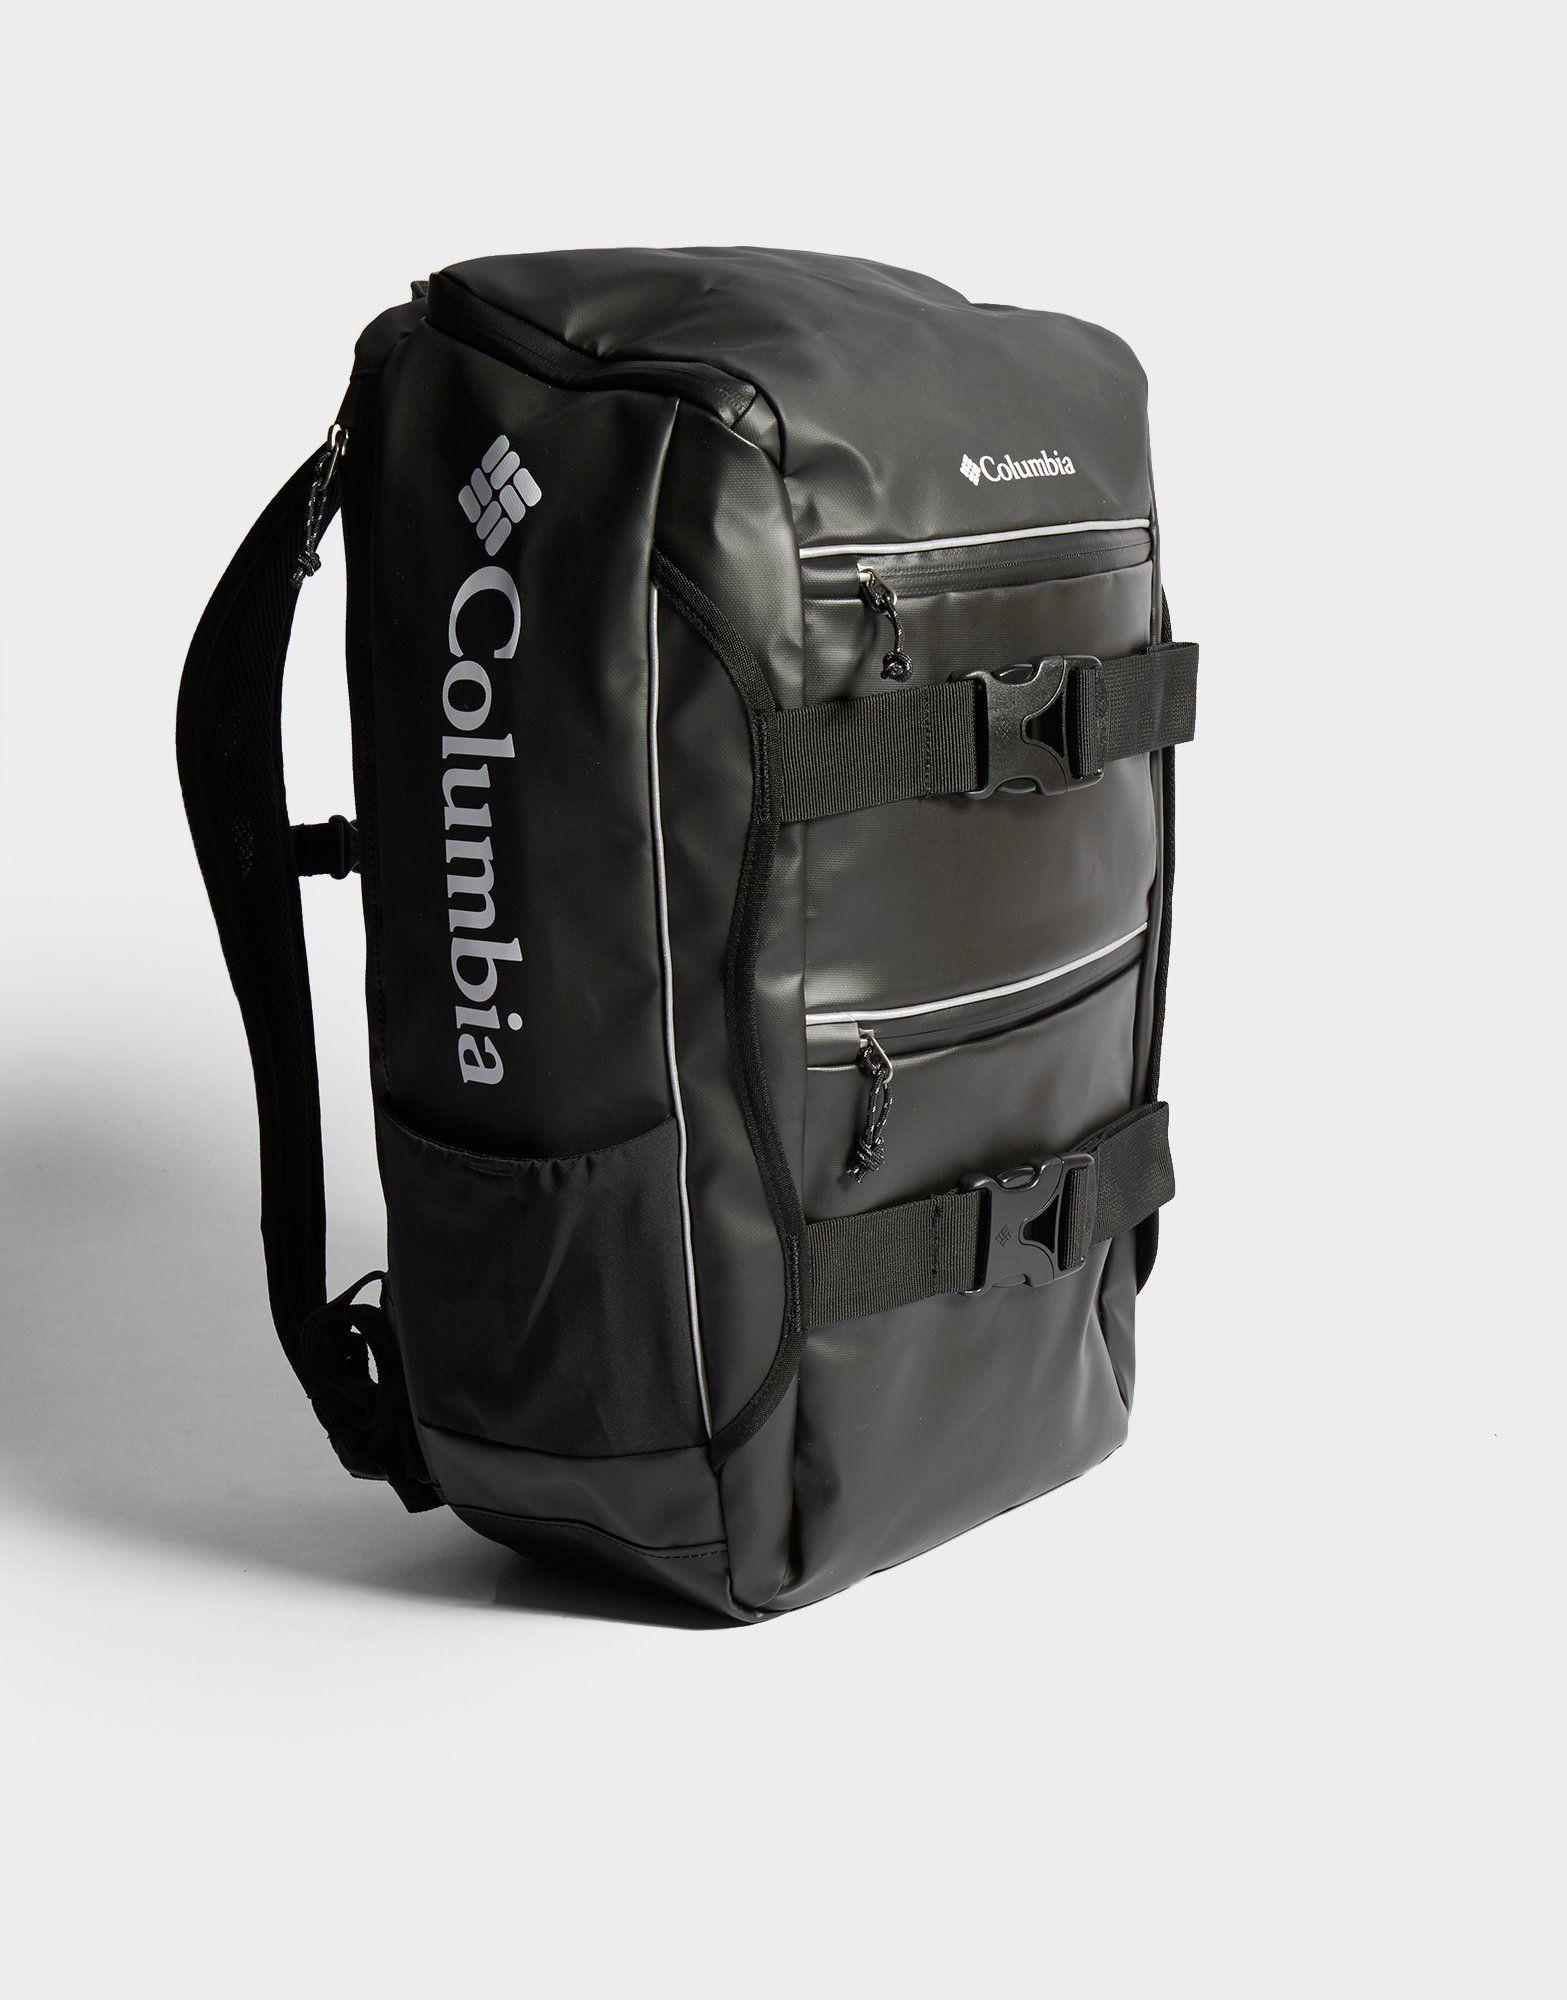 655ce1b306 Columbia Street Elite Backpack | JD Sports Ireland